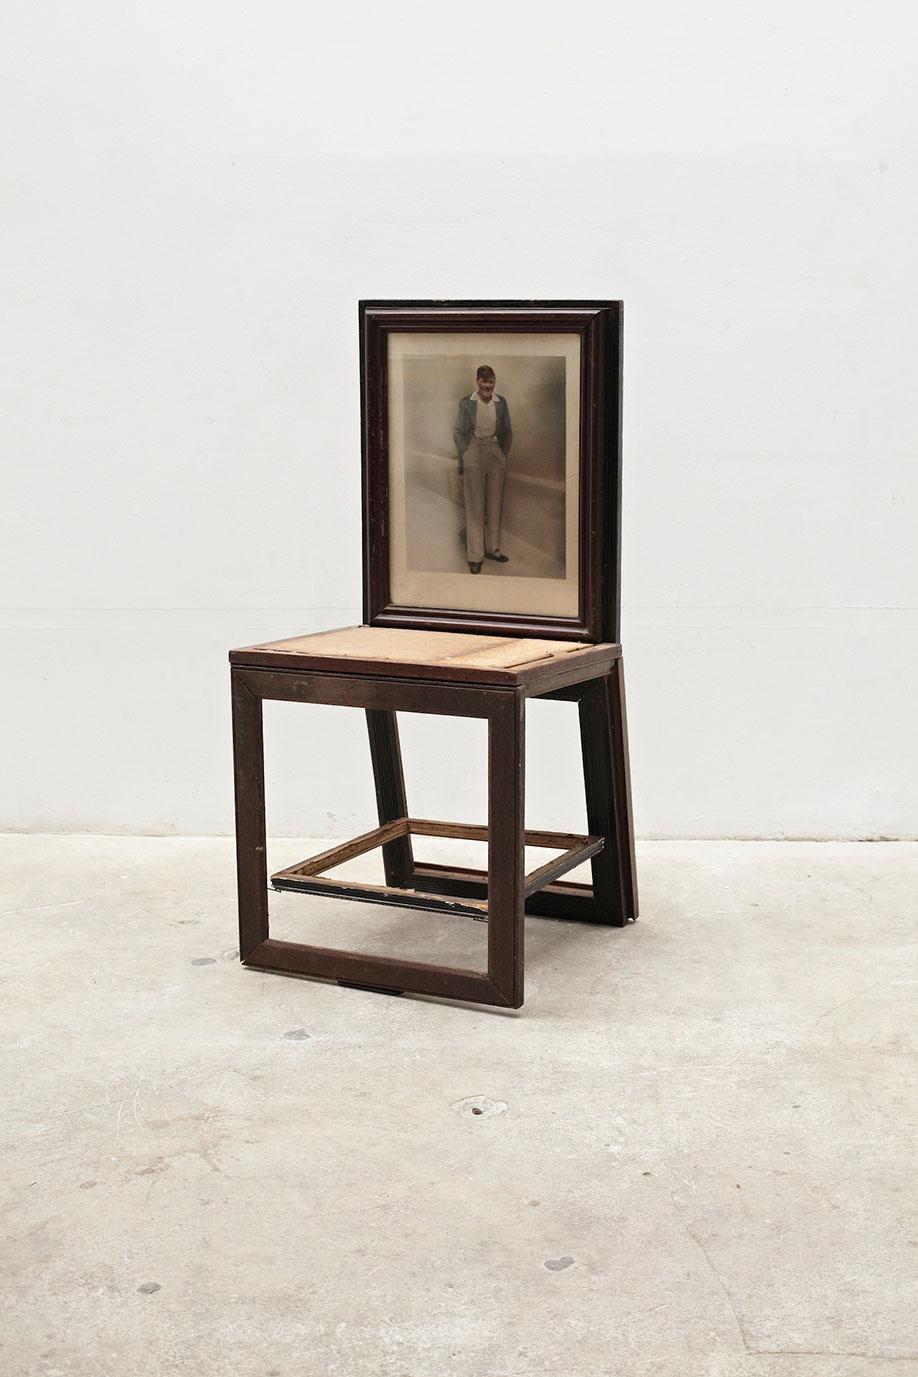 <b>Title:</b>Maverick VIII<br /><b>Year:</b>2011<br /><b>Medium:</b>Found picture frames<br /><b>Size:</b>98 x 46 x 48 cm